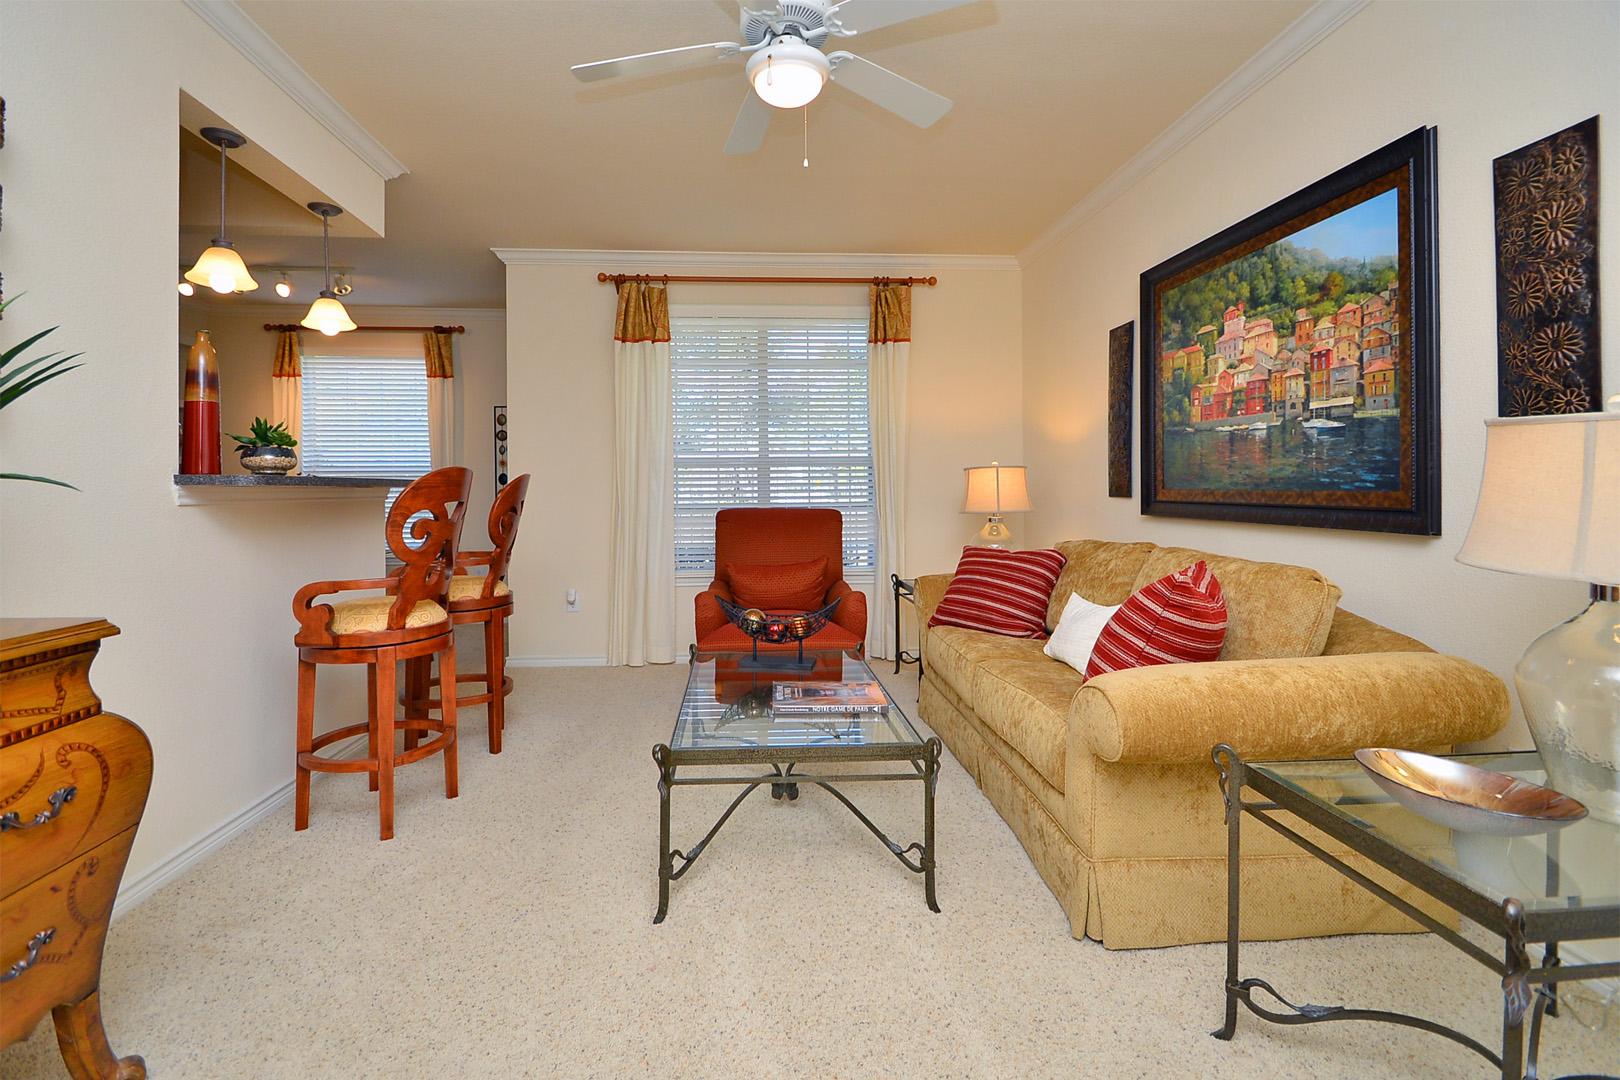 The Lakes at Cinco Ranch Apartments in Katy, TX image 32